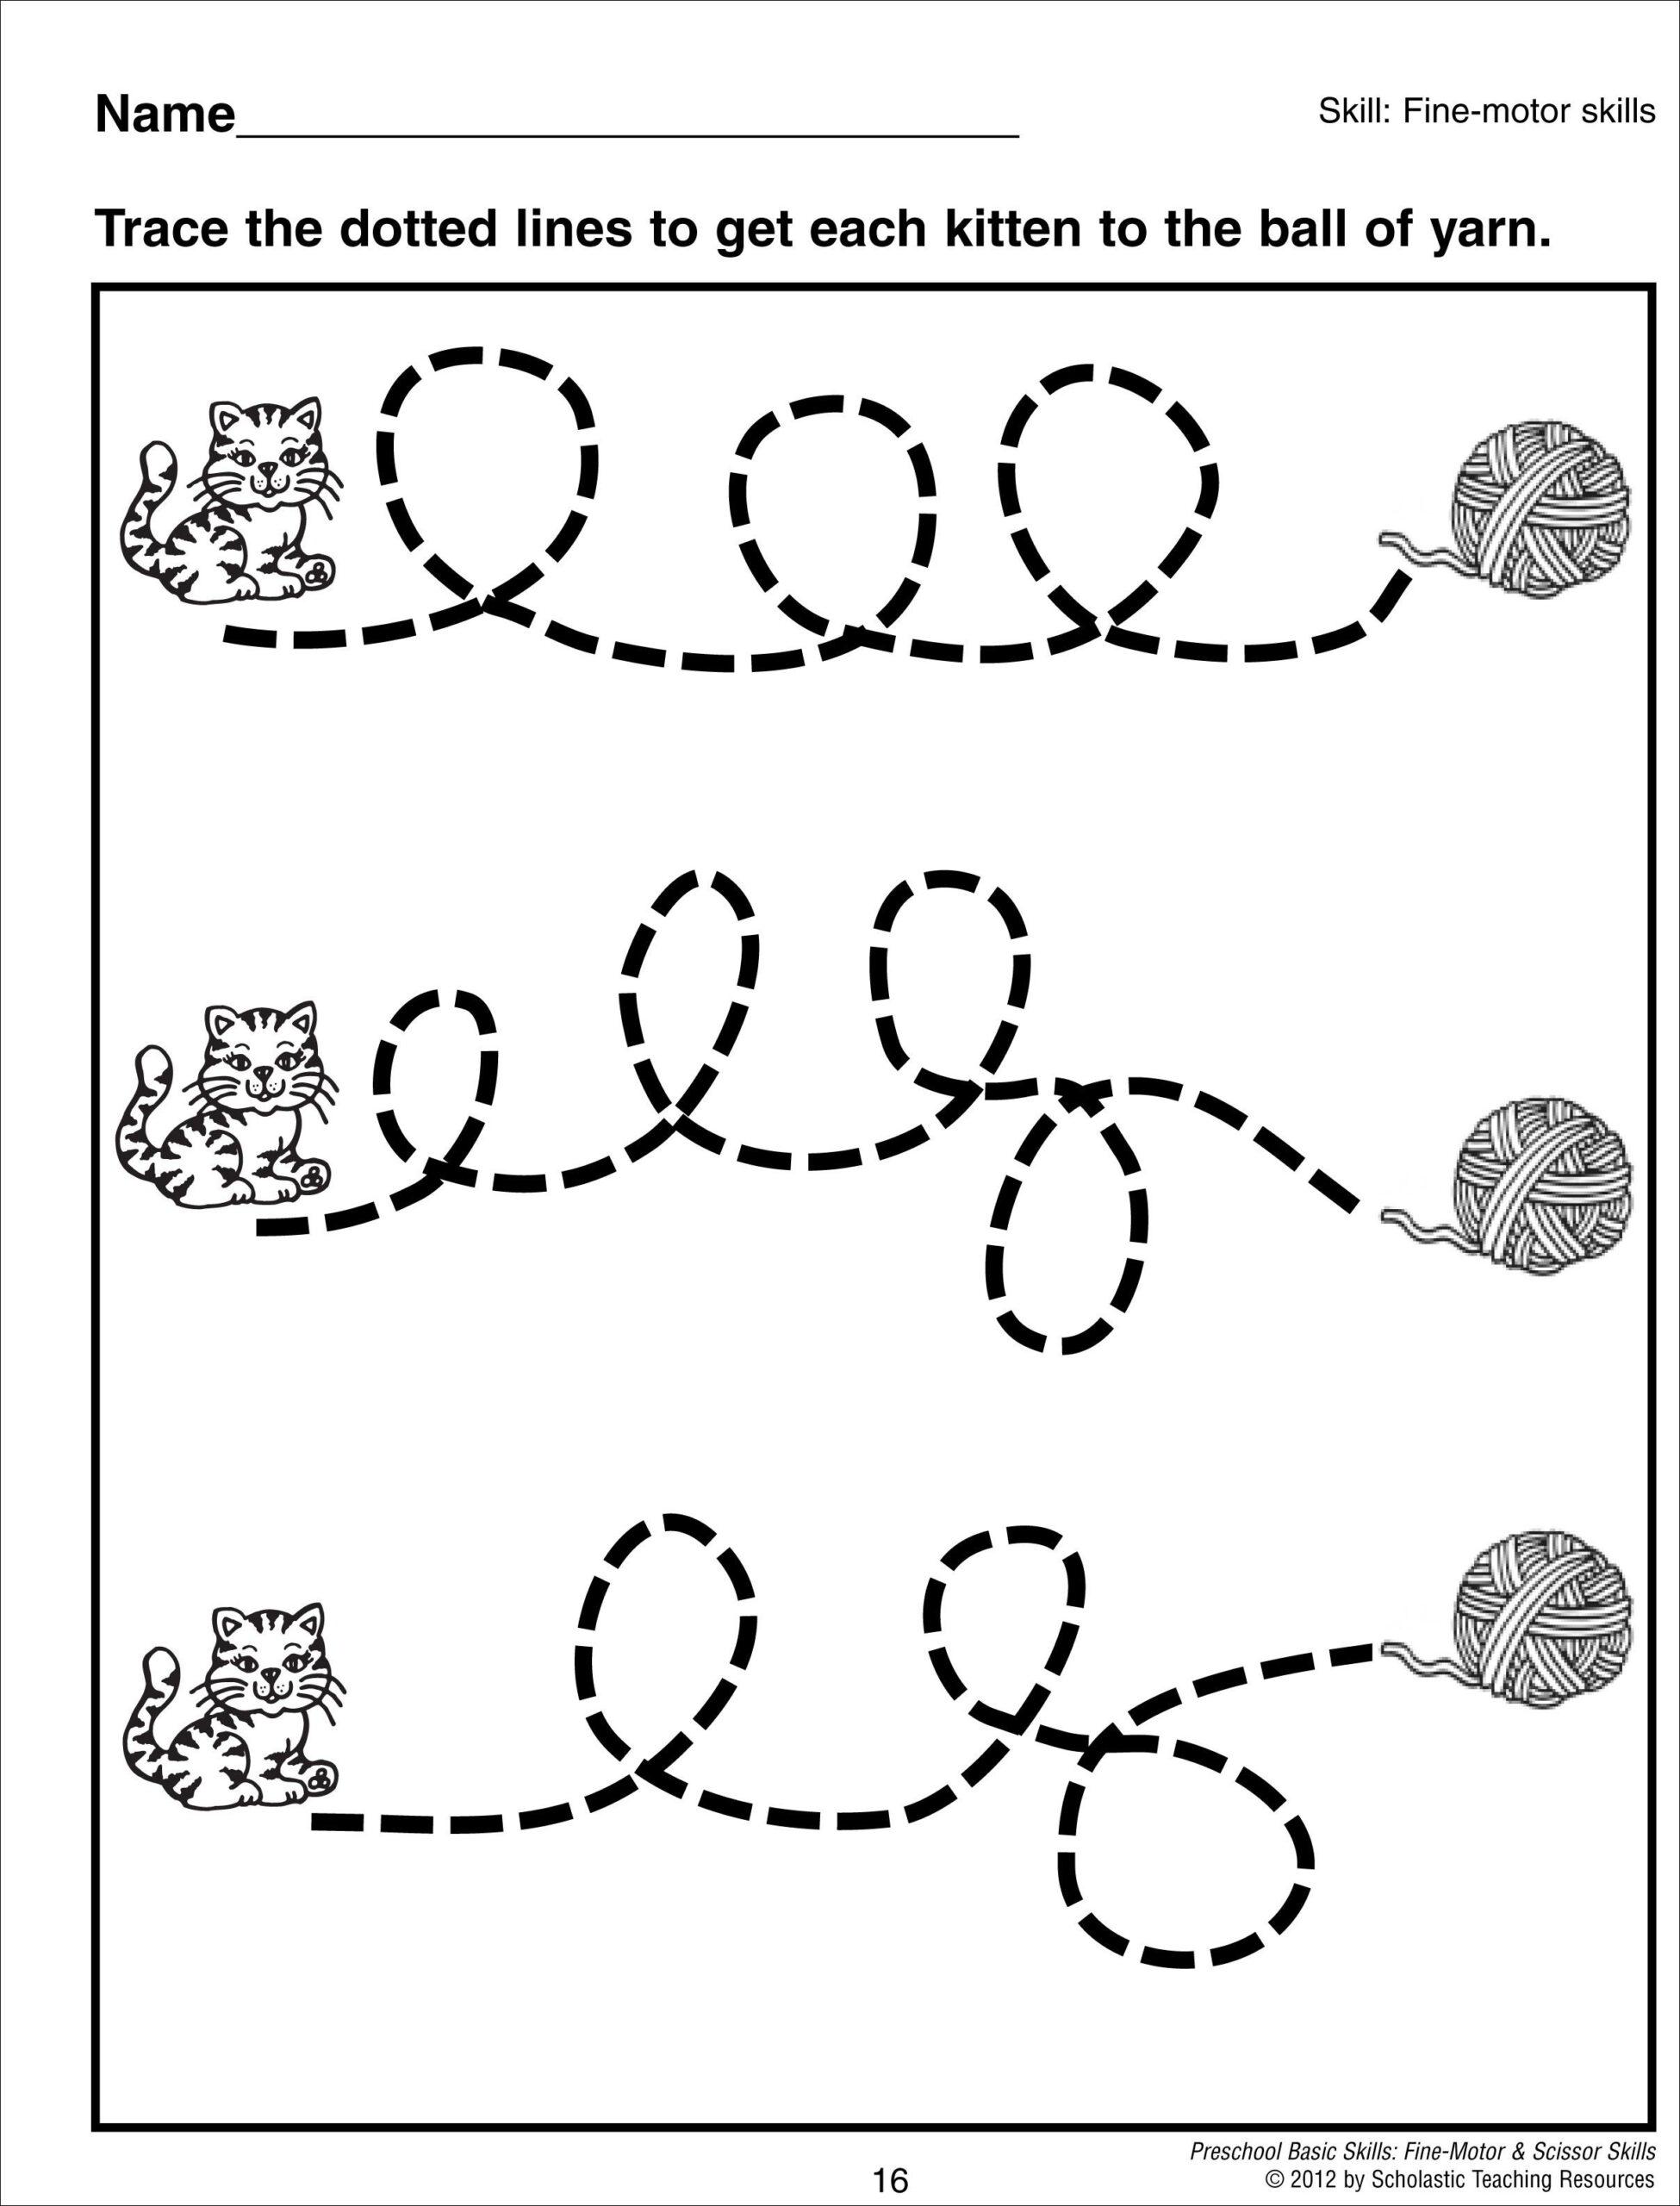 Tracing Curvy Lines Preschool Basic Skills Fine Motor Early